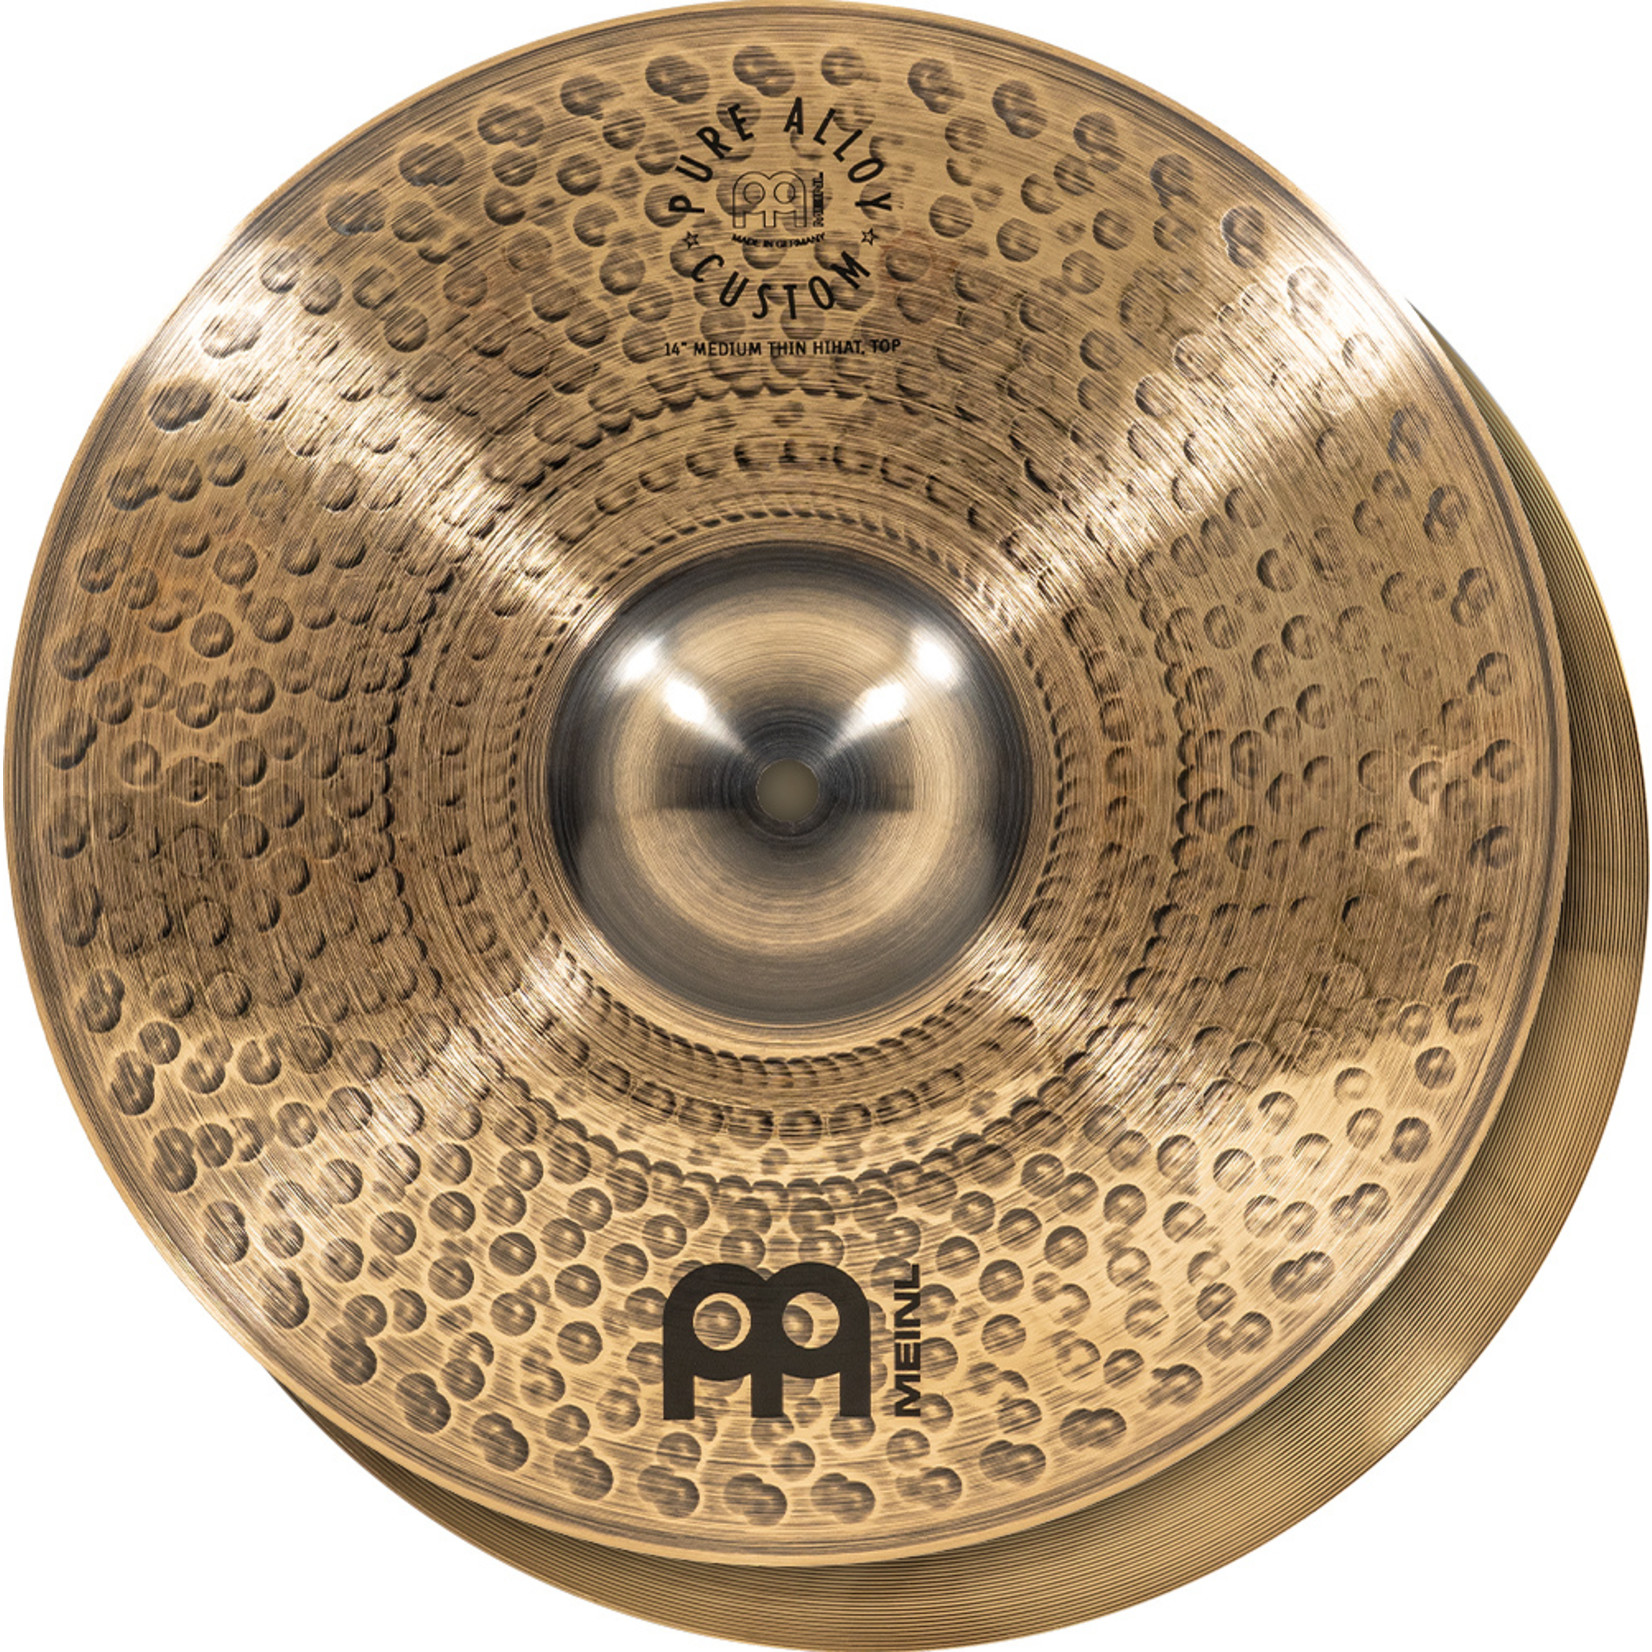 Meinl Meinl 14''  Pure Alloy Custom Medium Thin Hihat, pair